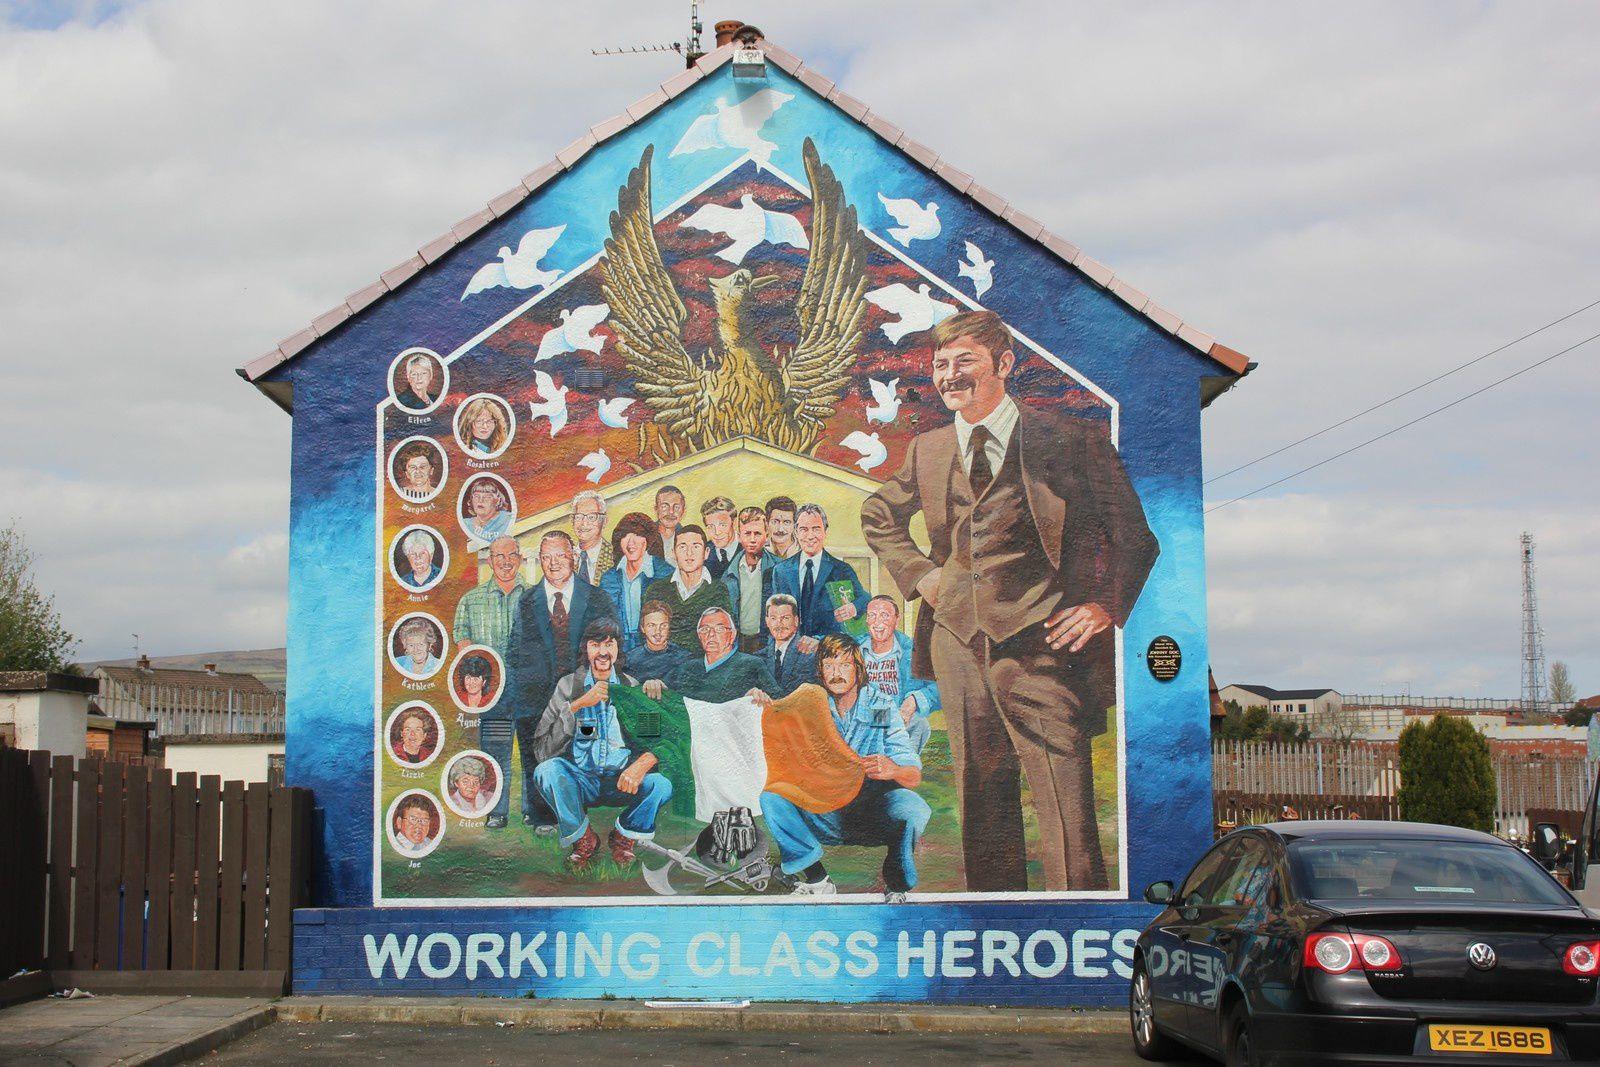 604) Ballymurphy road, West Belfast